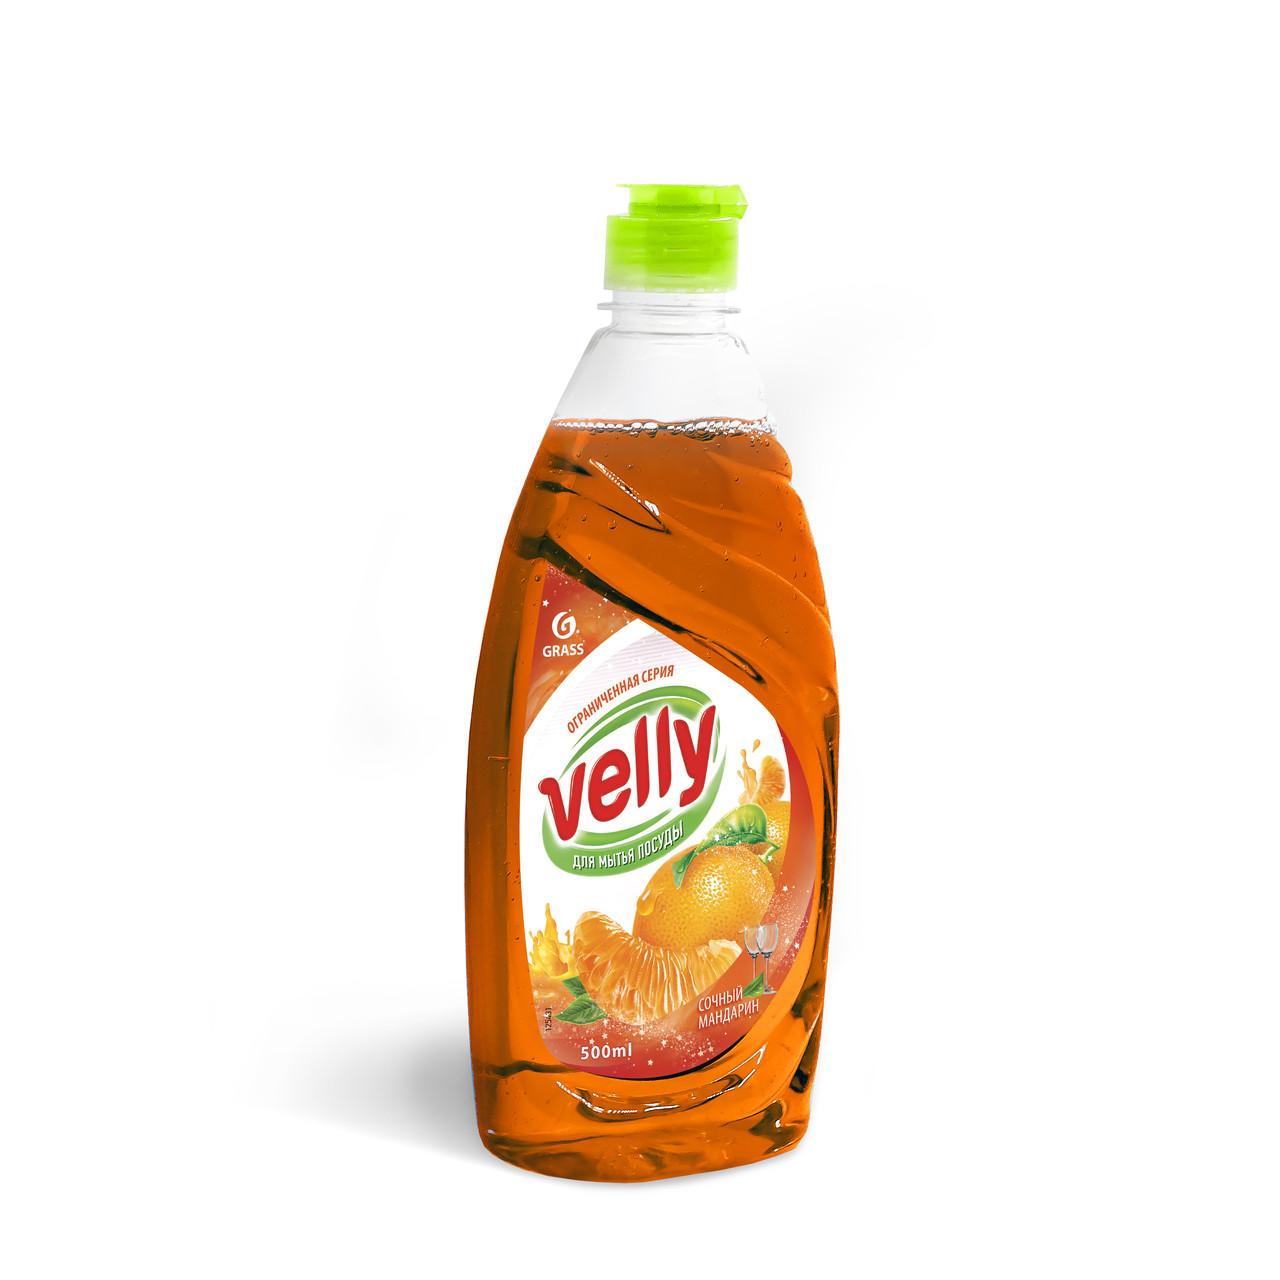 Средство для мытья посуды  «Velly  Сочный мандарин